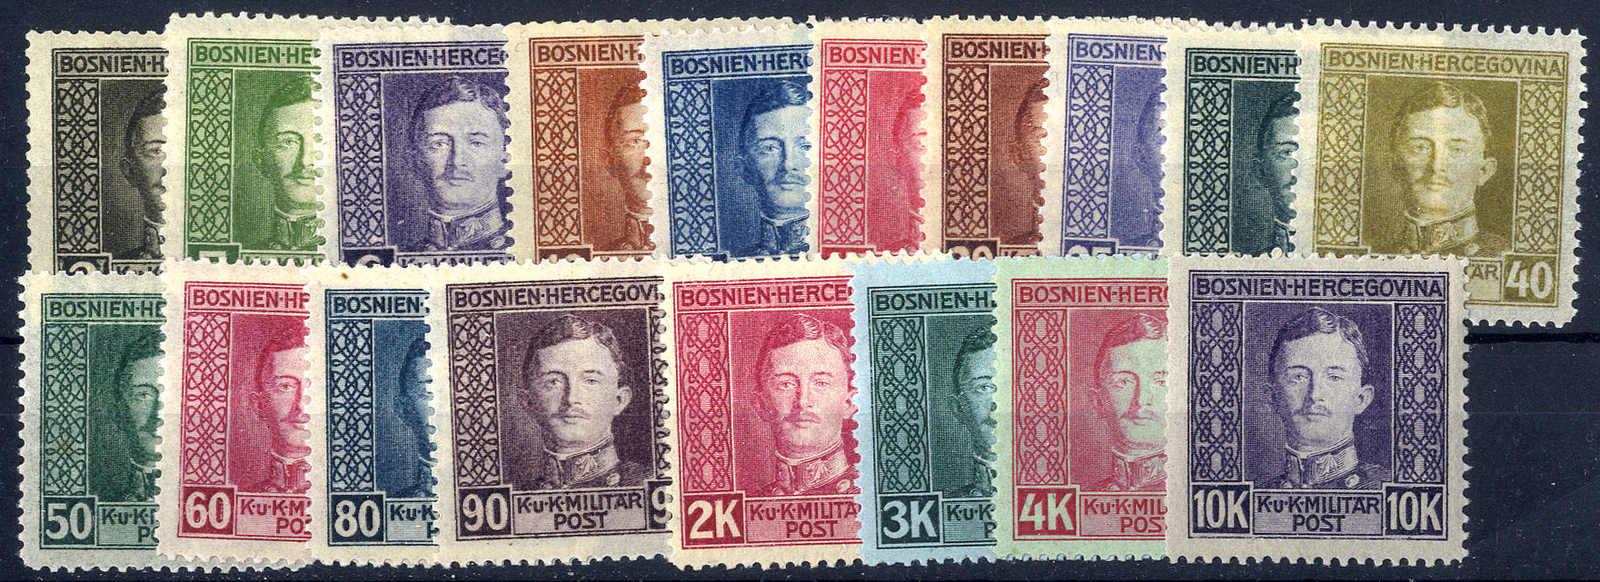 Lot 2769 - europe bosnia and herzegowina austria -  Viennafil Auktionen 63rd LIVE AUCTION